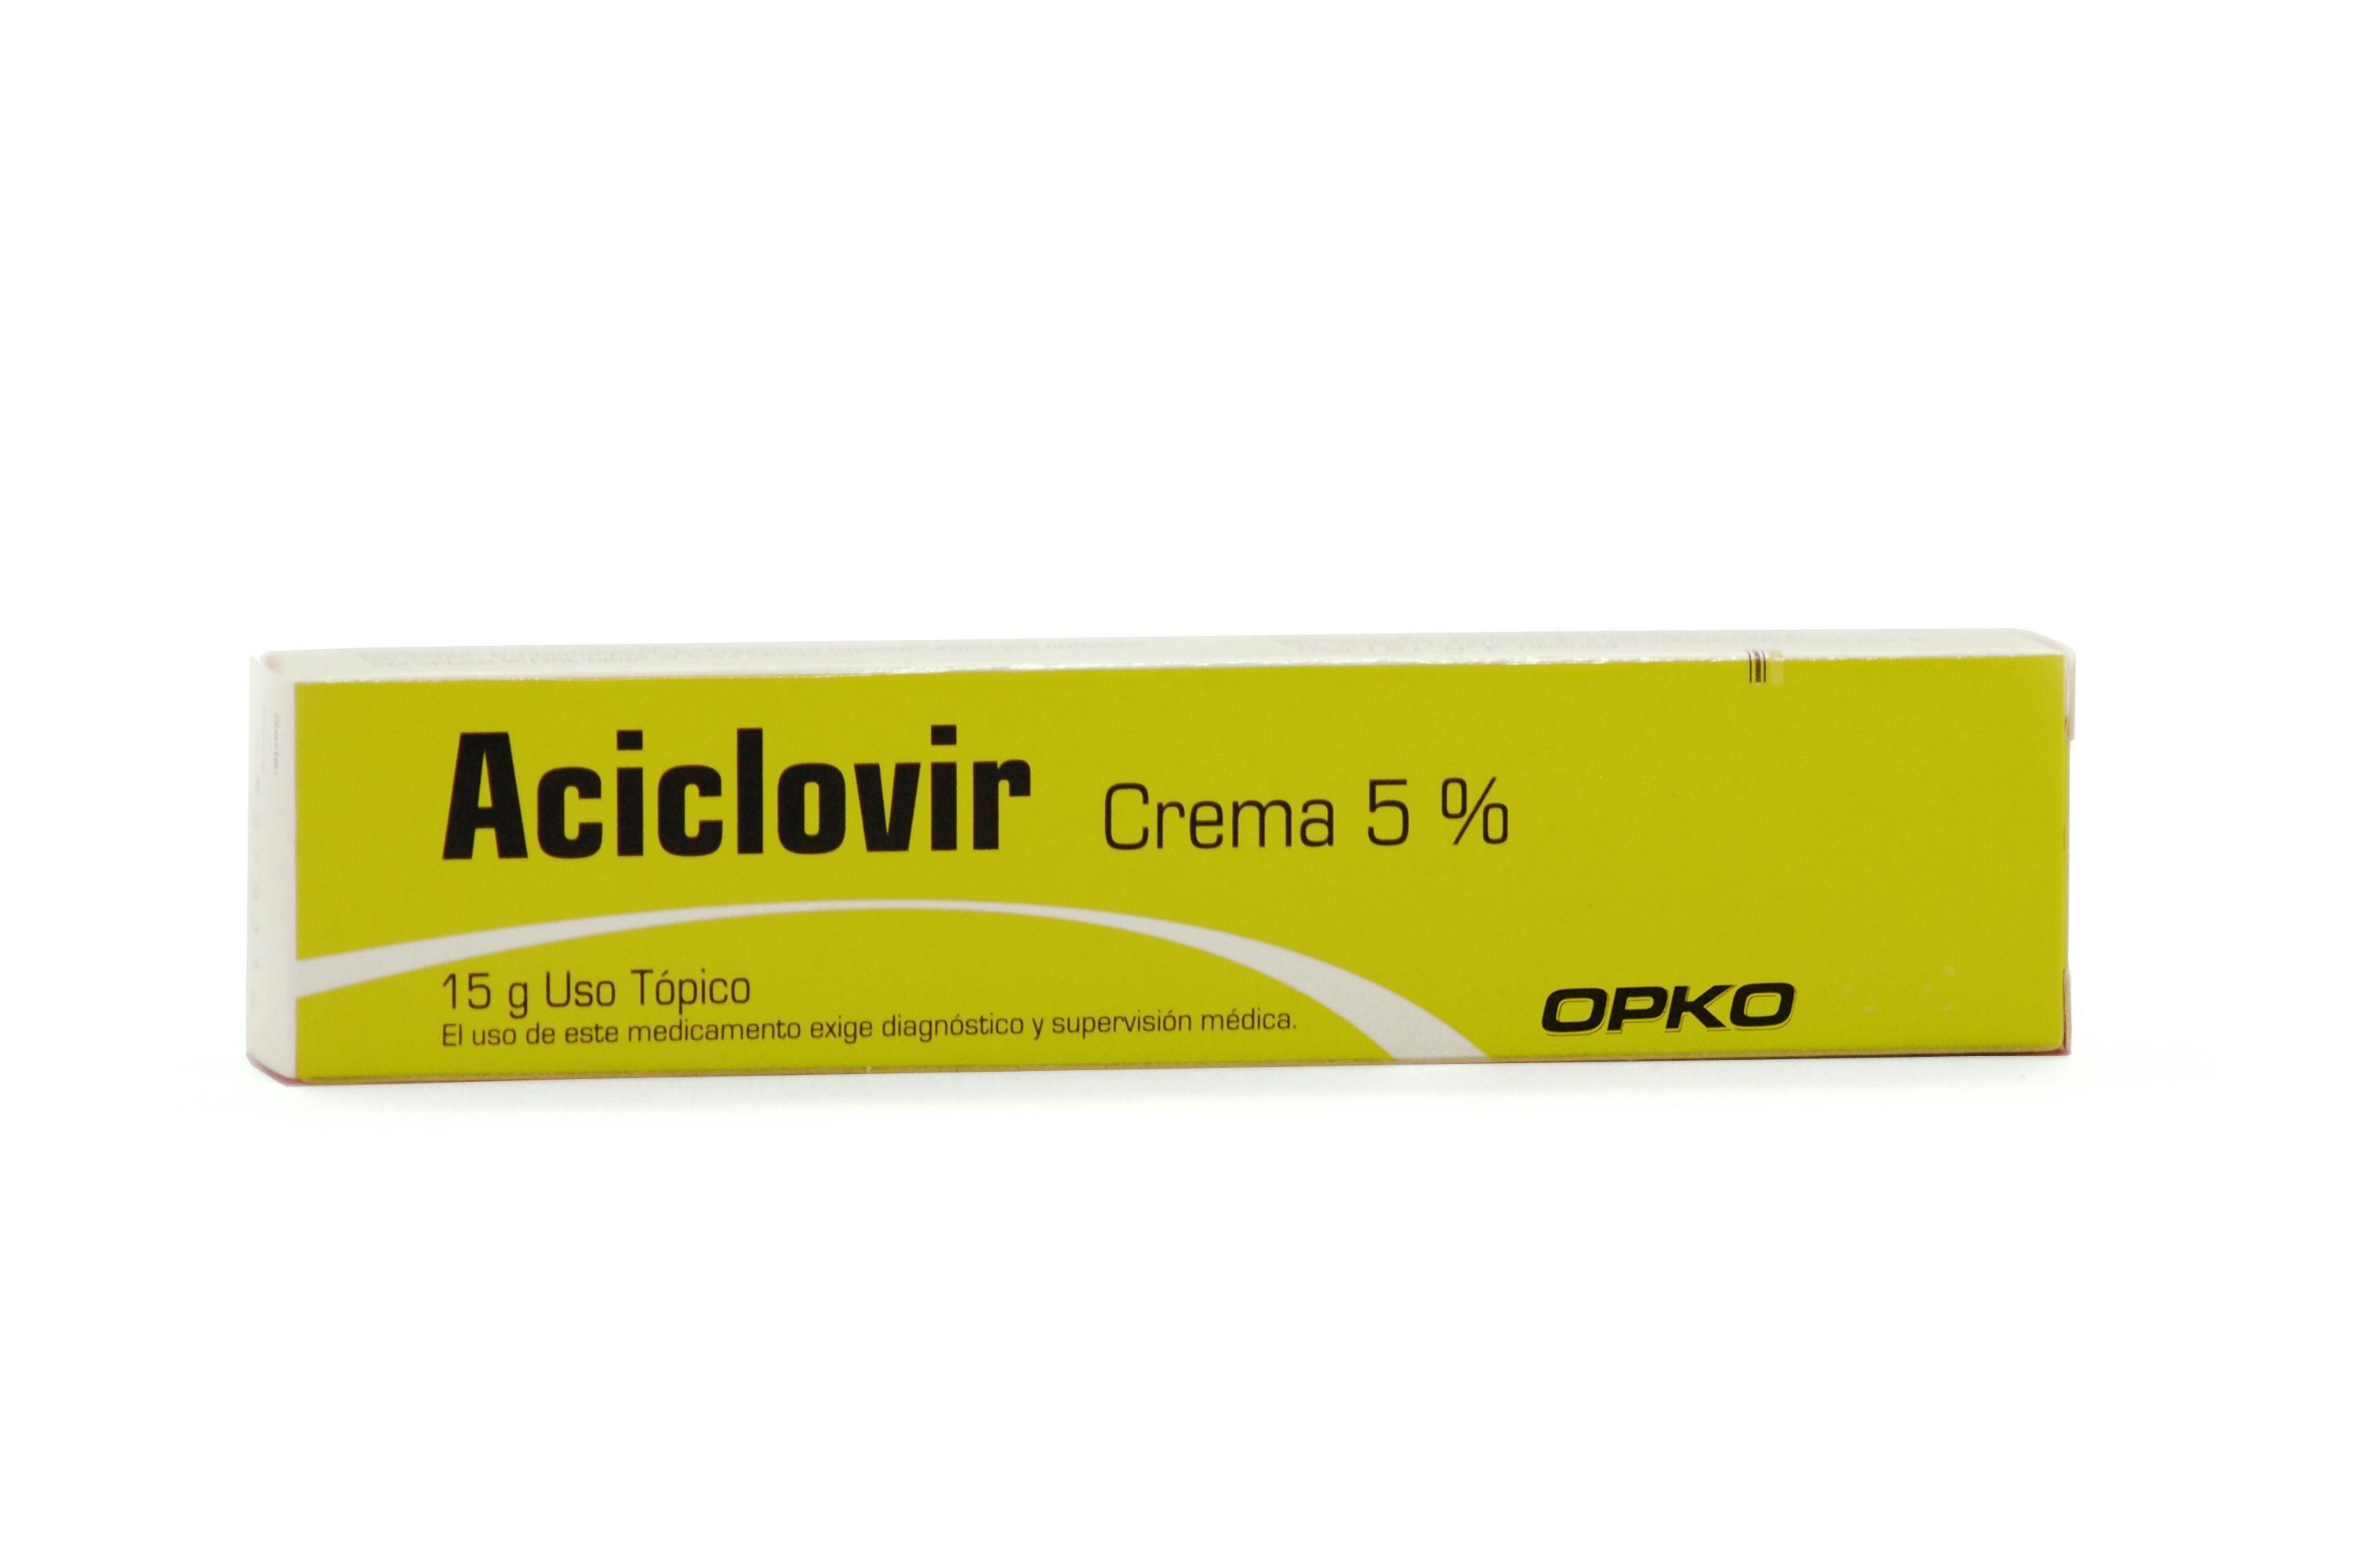 Aciclovir (Tópica)